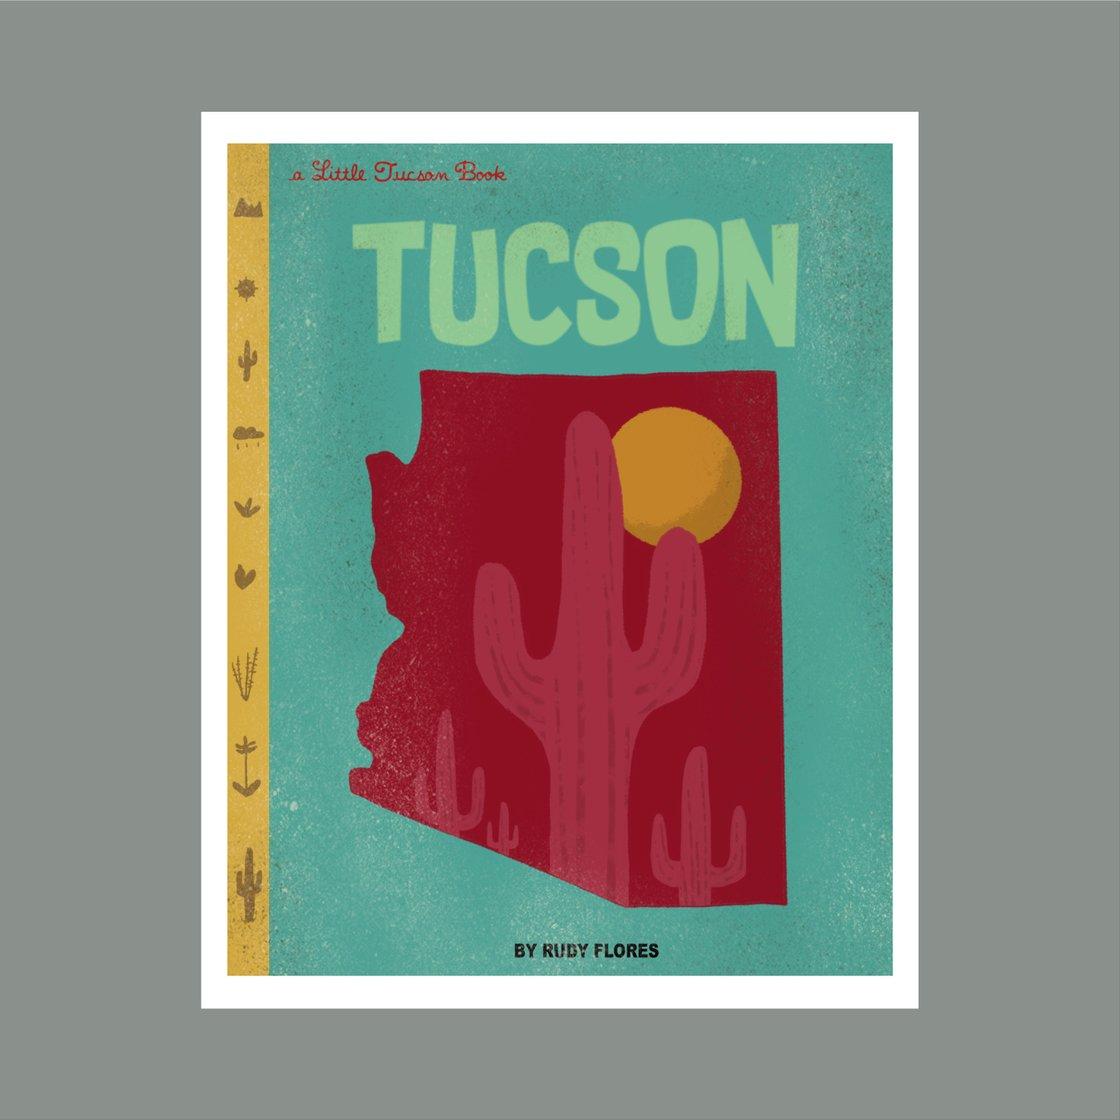 Image of Tucson